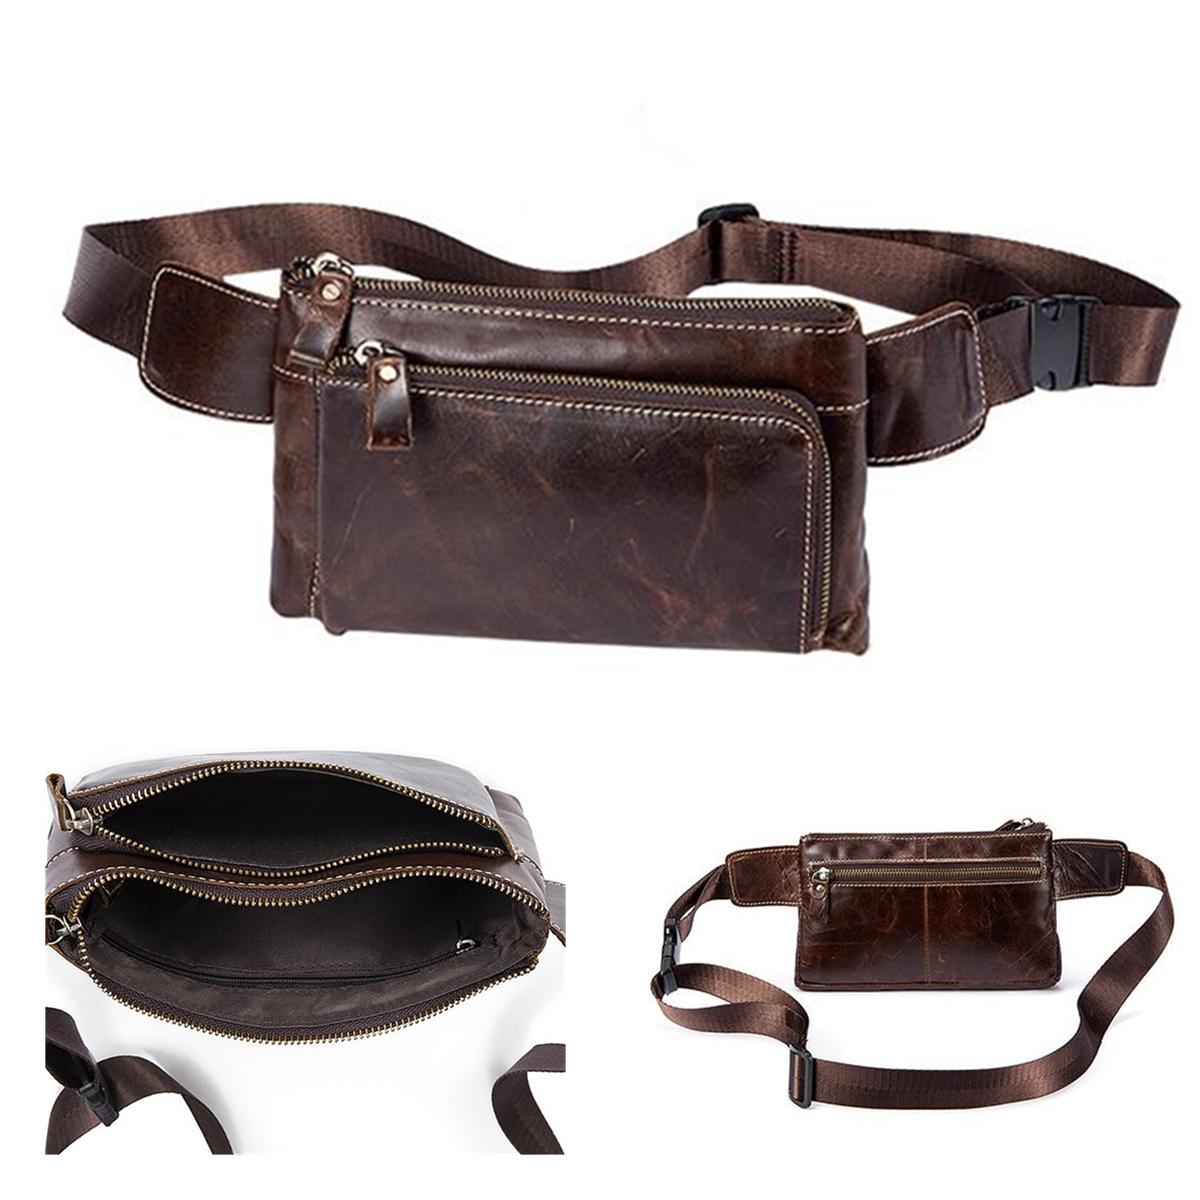 Men Multifunctional Vintage Oil Wax Genuine Leather Waist Bag Phone Case Waist Belt Storage Bag